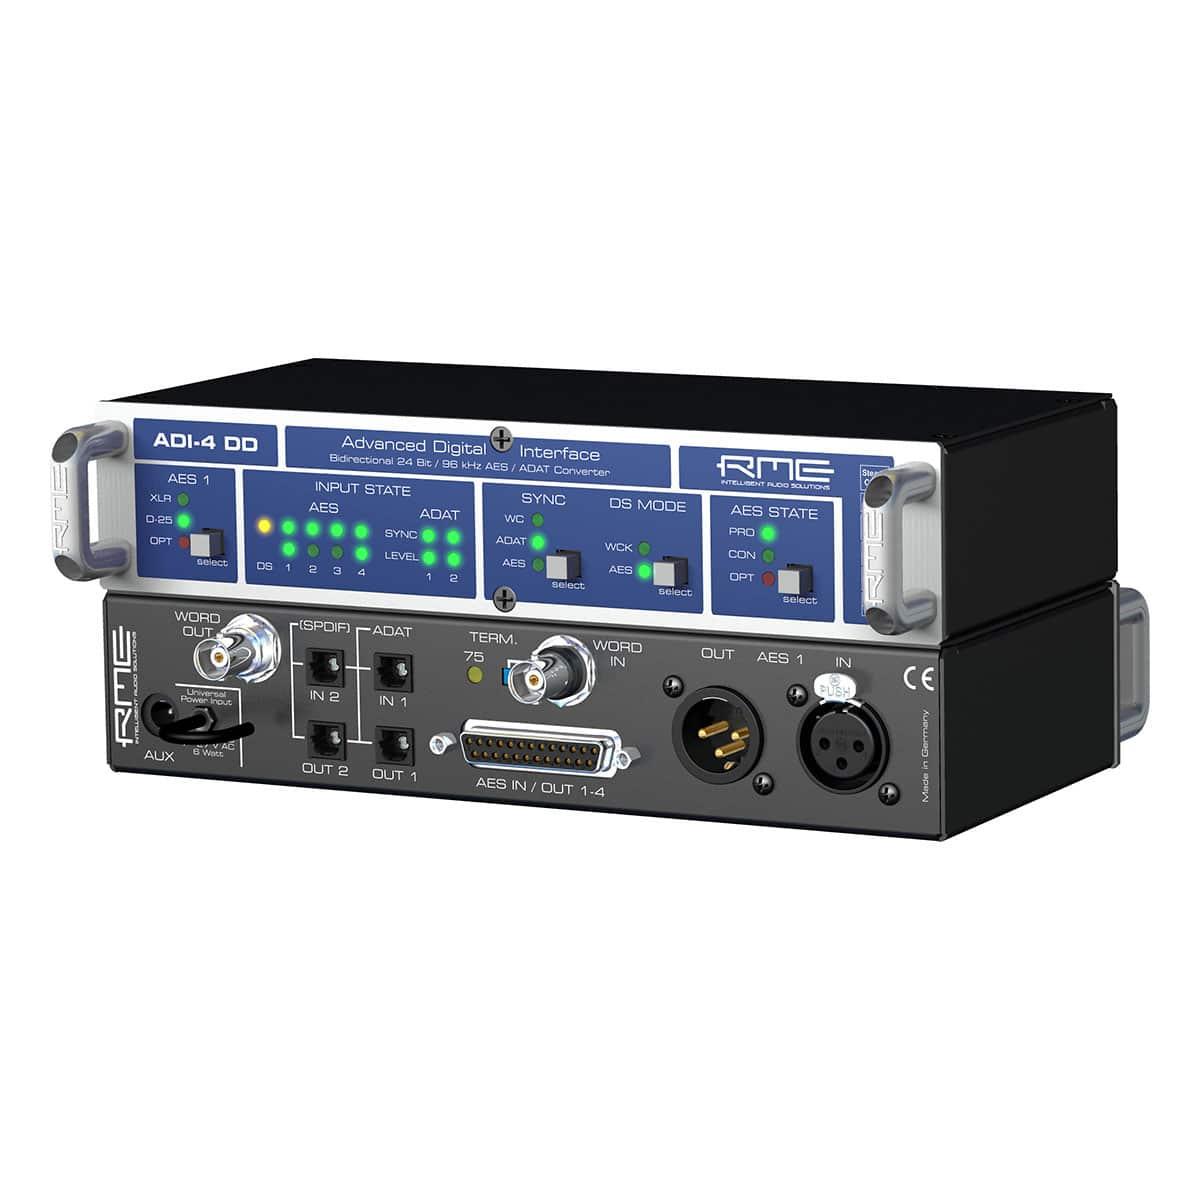 RME ADI 4 DD 03 Convertitori Audio, Pro Audio, Audio Digitale